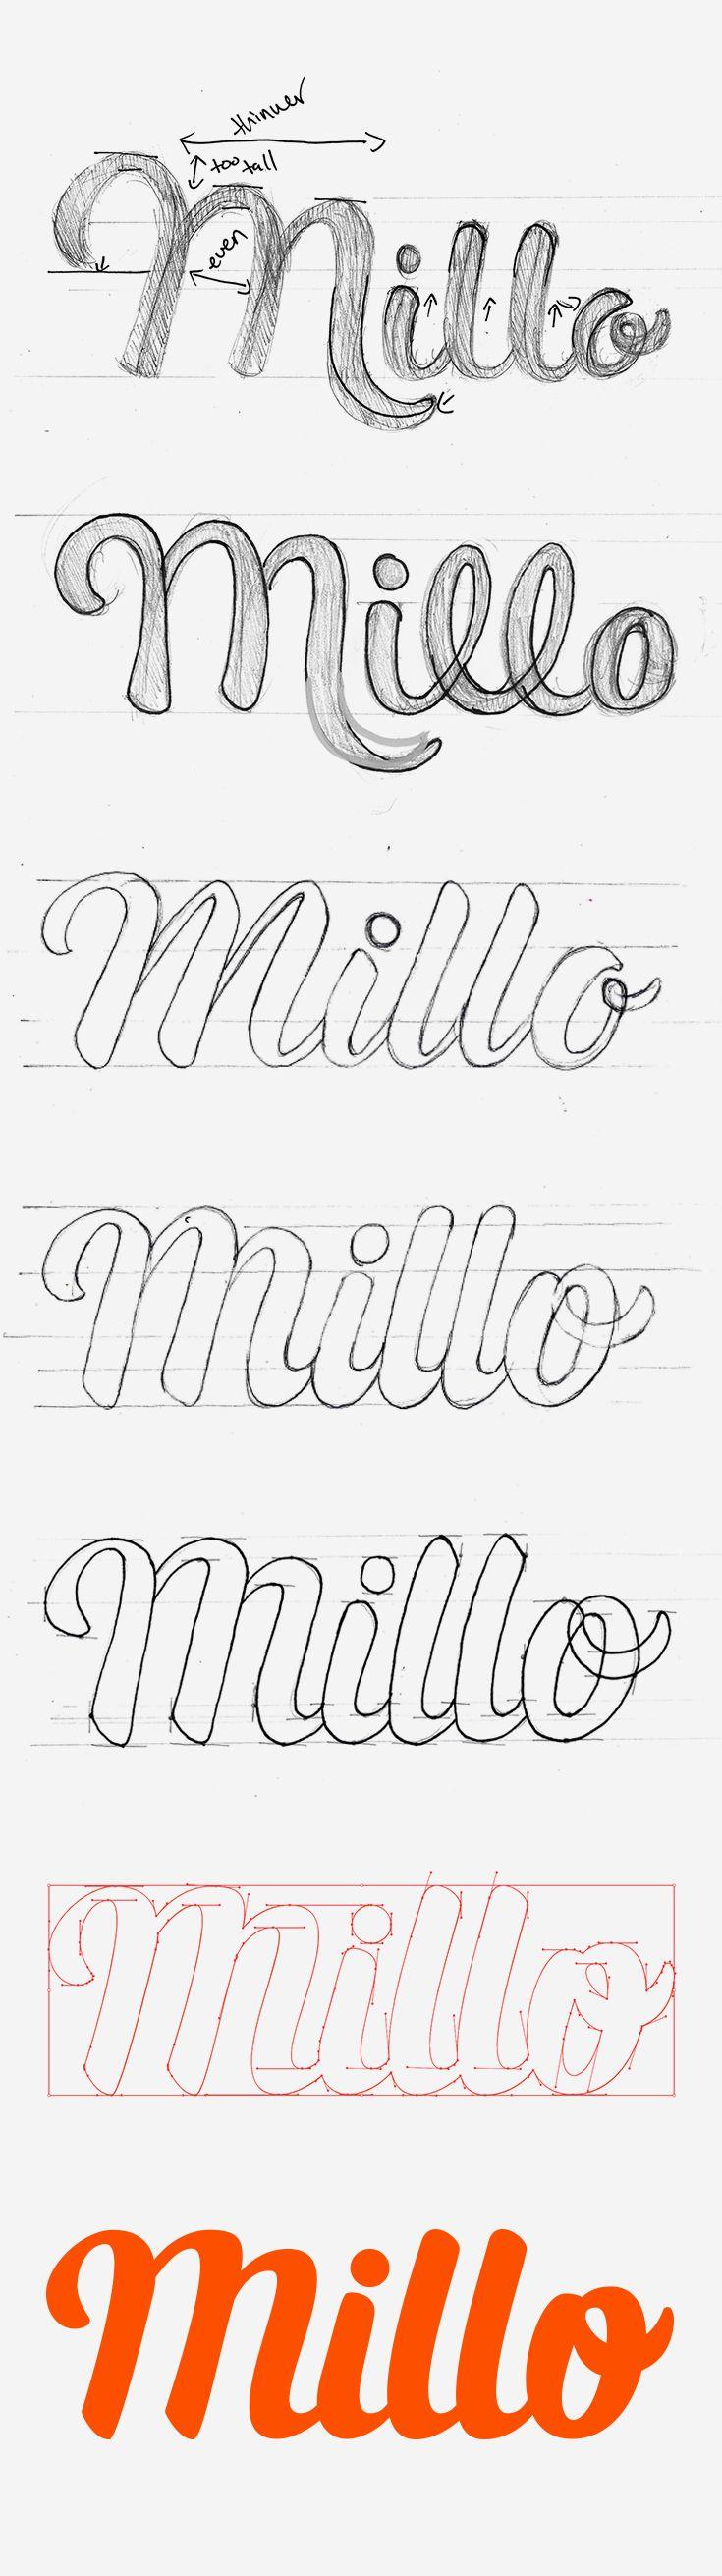 Millo Logo Design Case Study